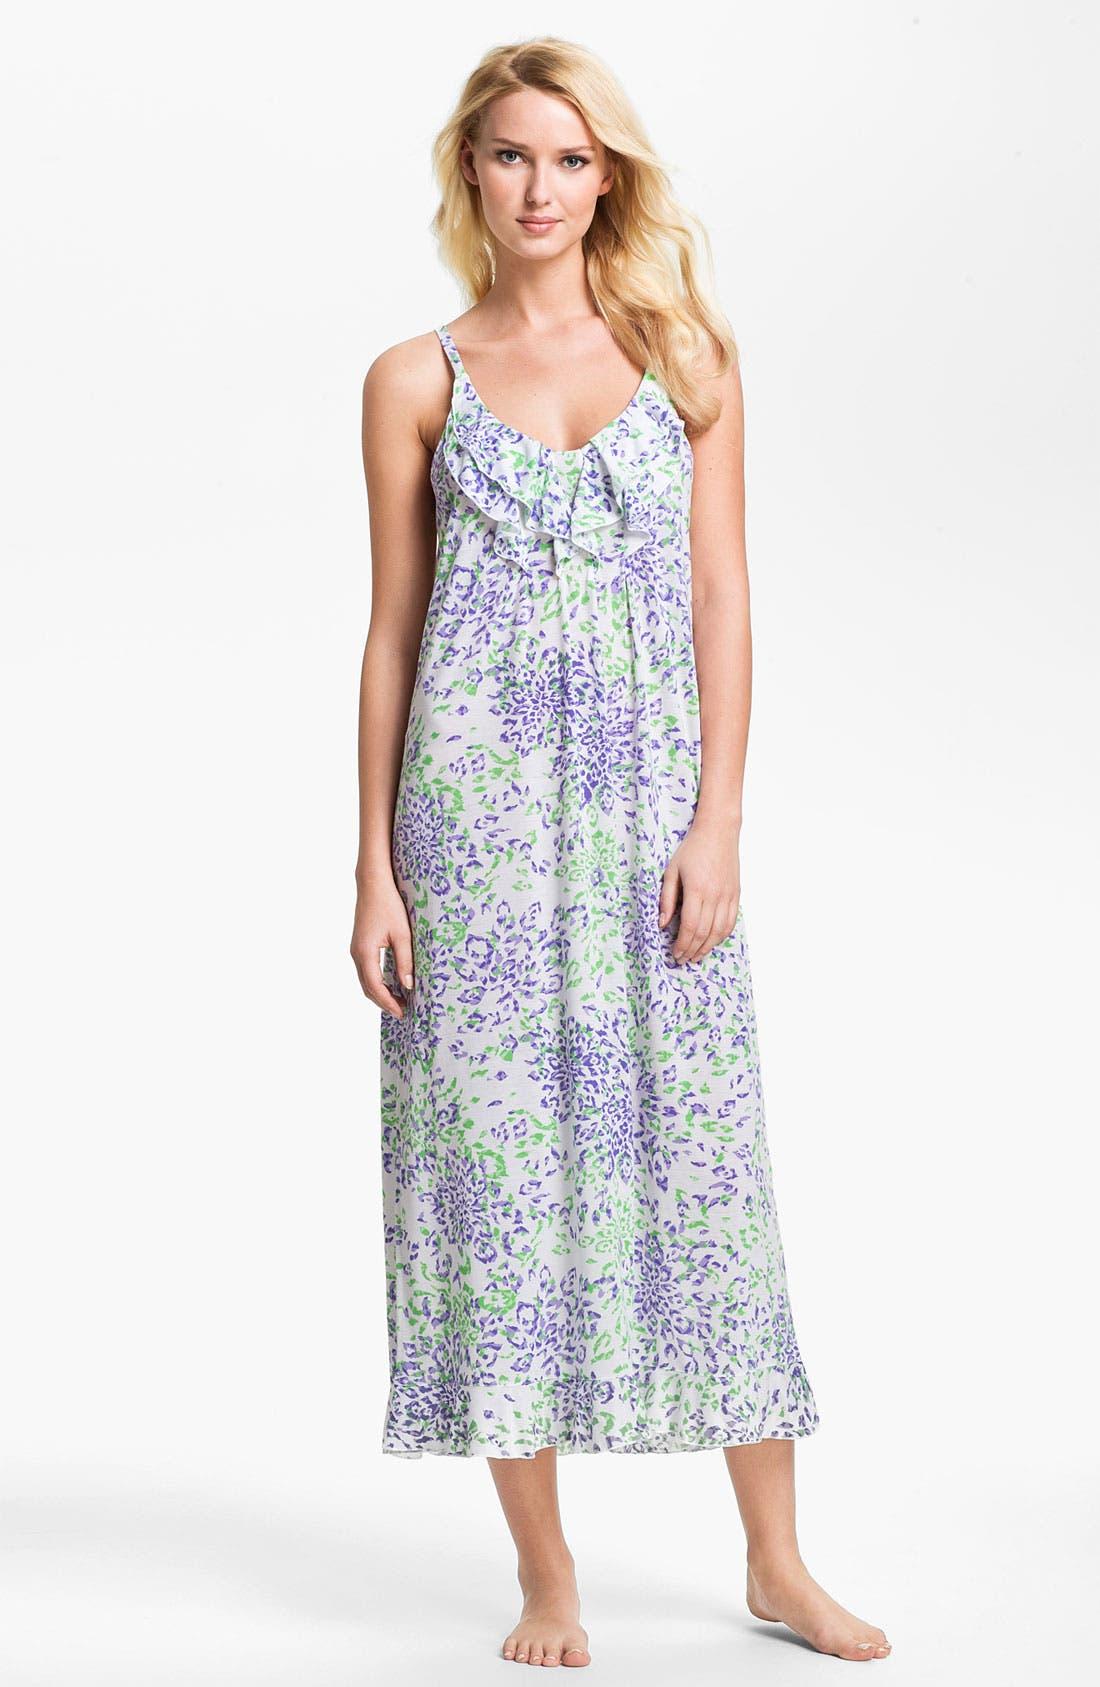 Main Image - Oscar de la Renta Sleepwear 'Animal Blossom' Nightgown